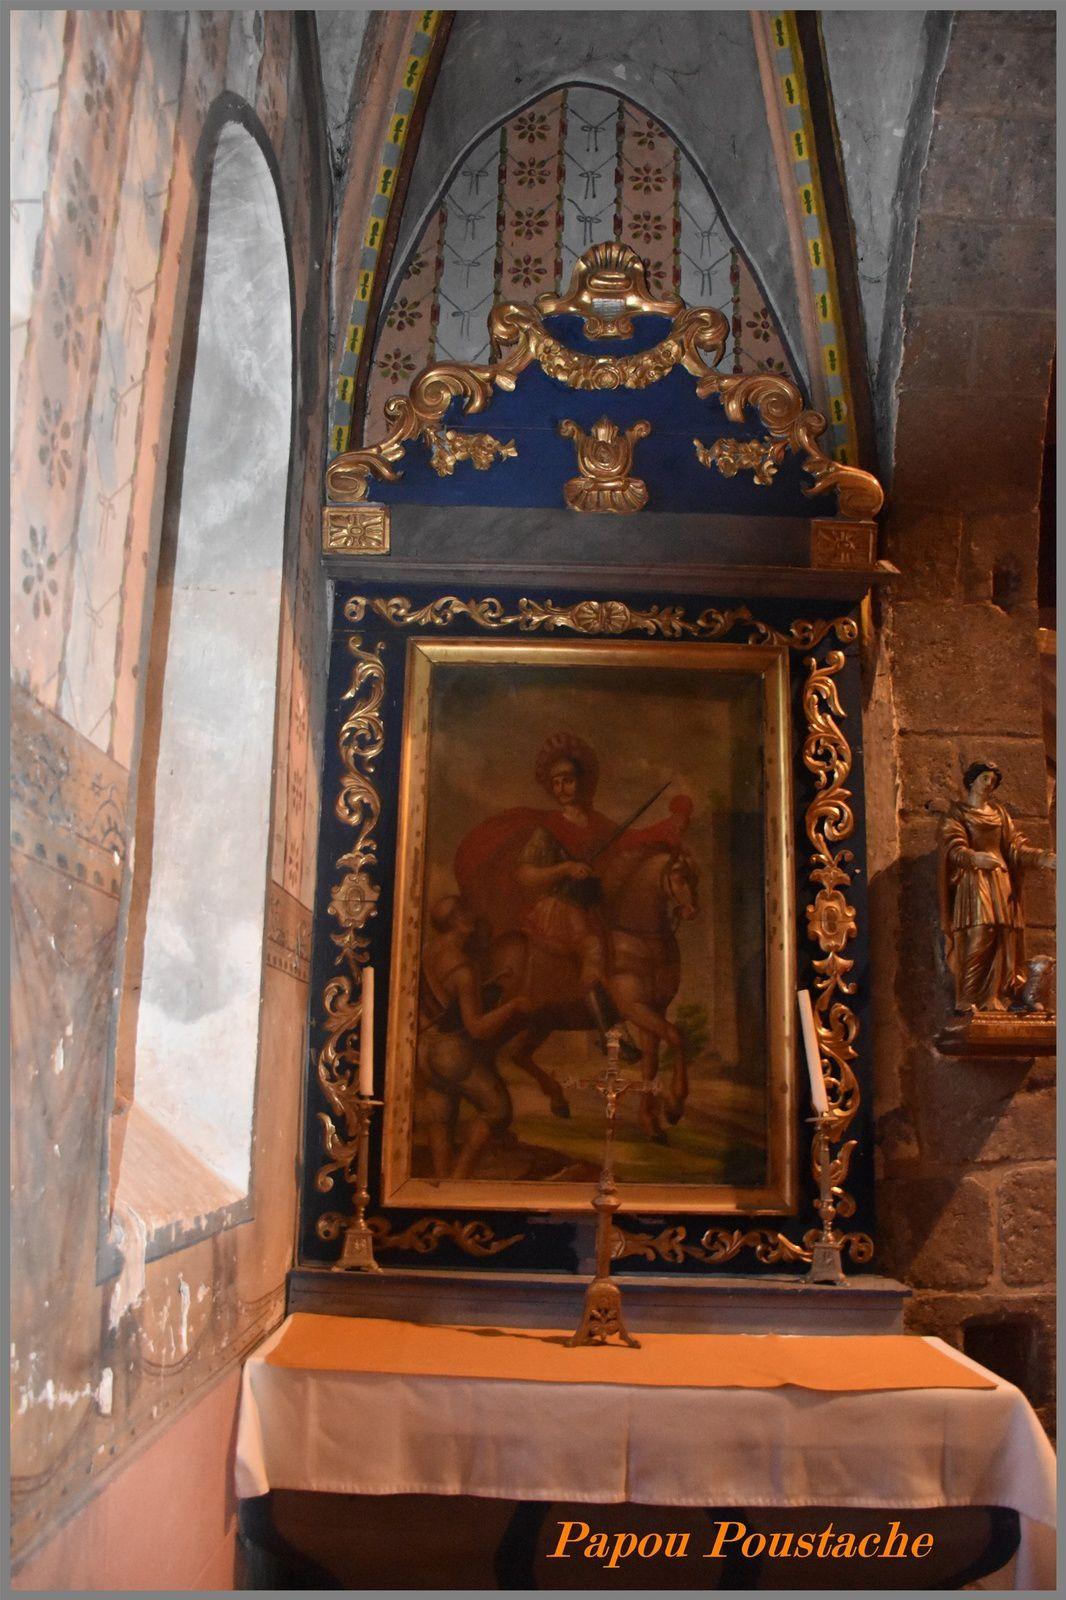 Saint Cernin